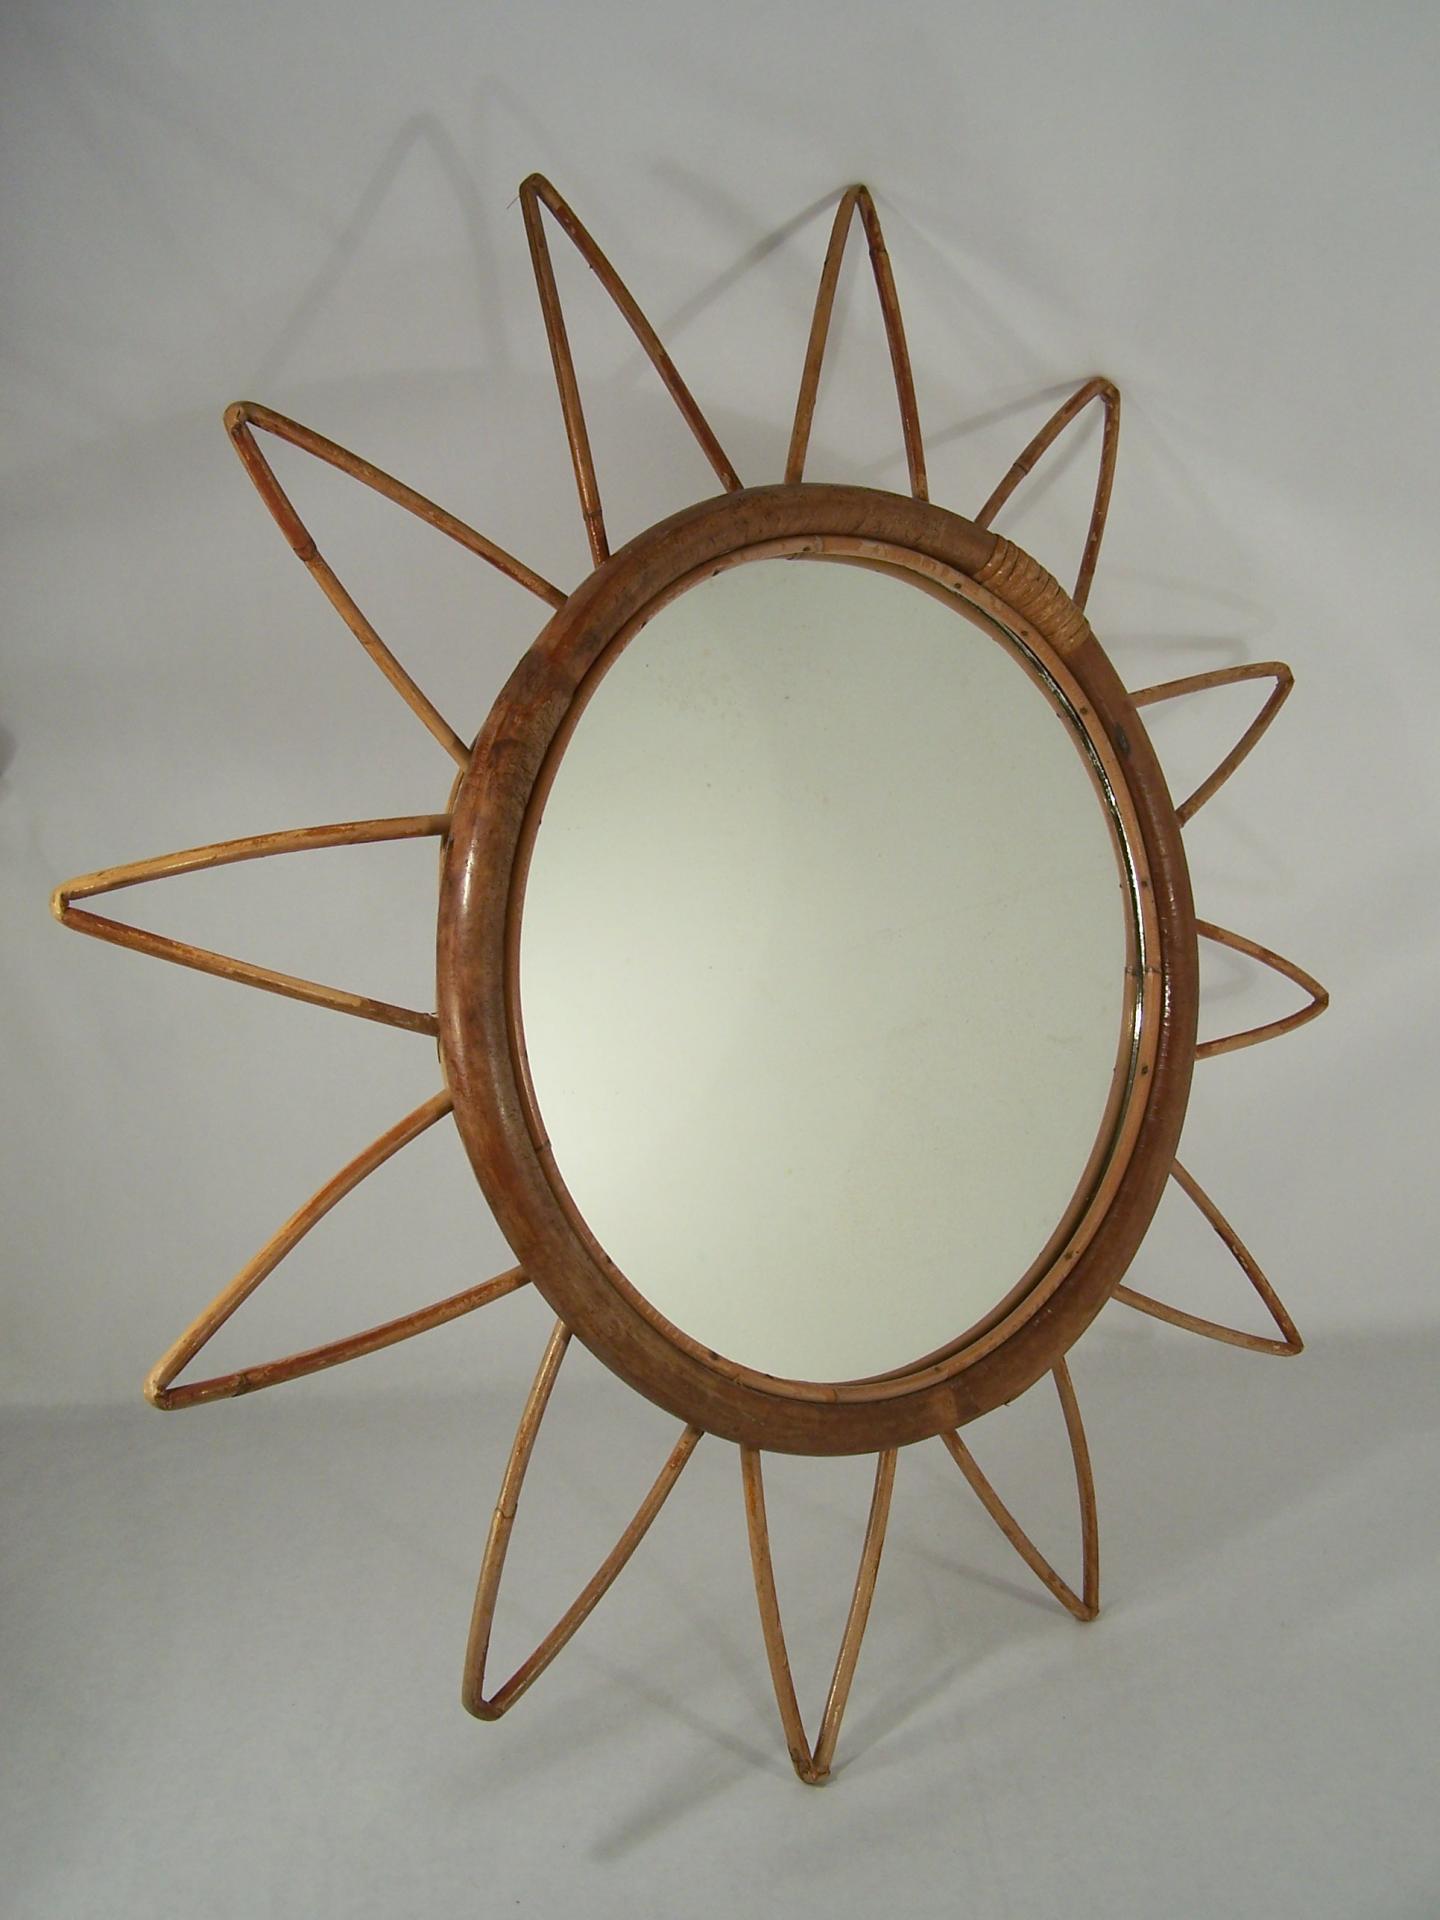 Miroir soleil vintage miroir en osier miroir en rotin for Glace soleil miroir